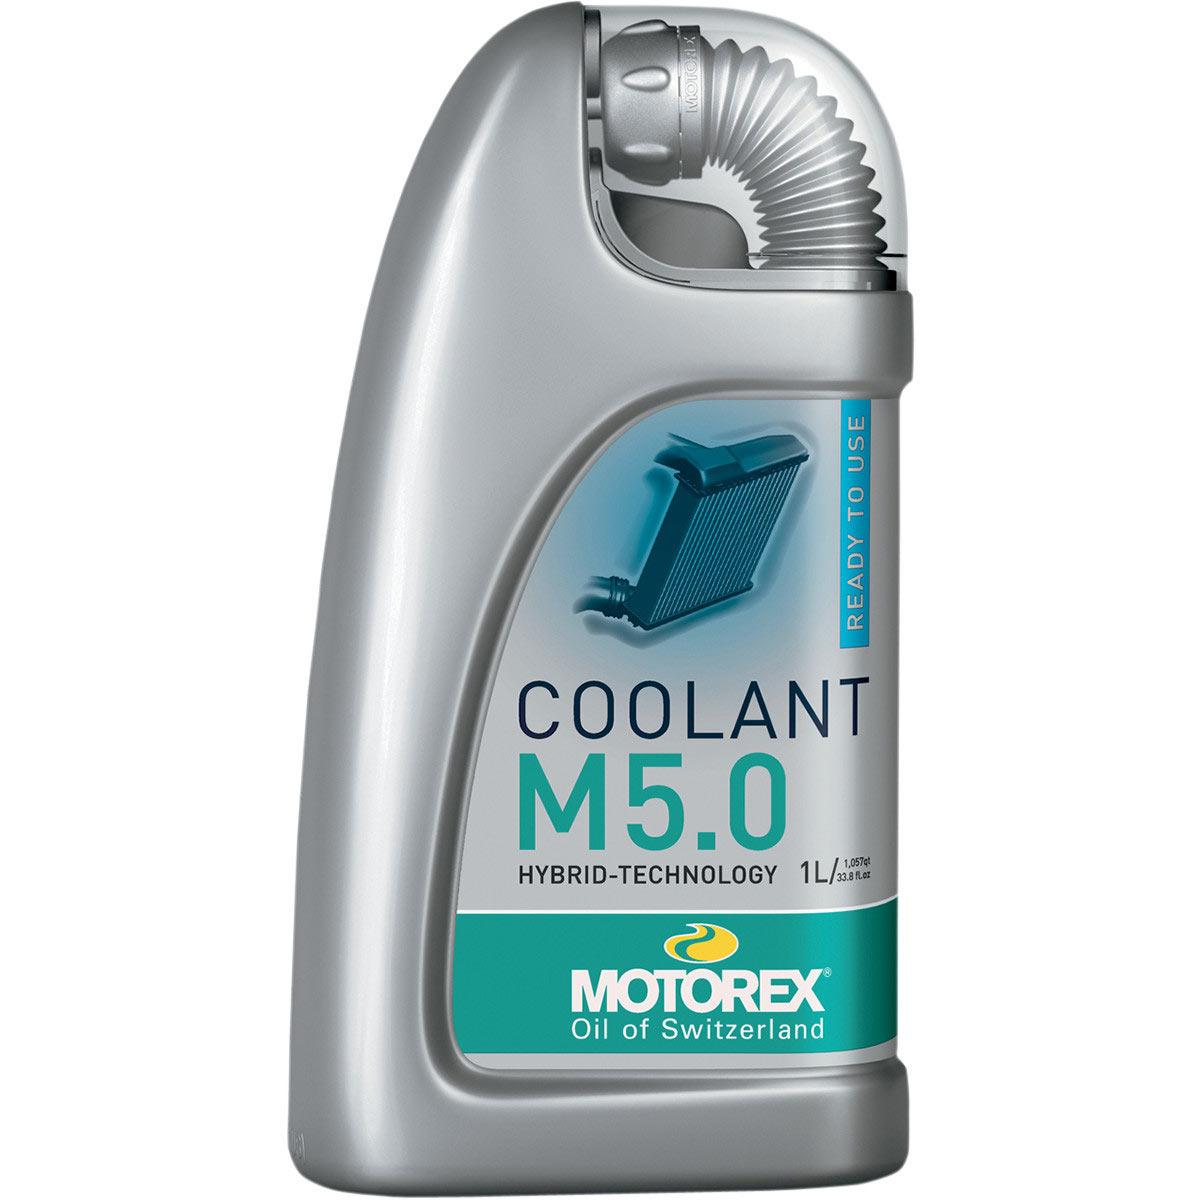 Motorex Coolant M5.0 1L